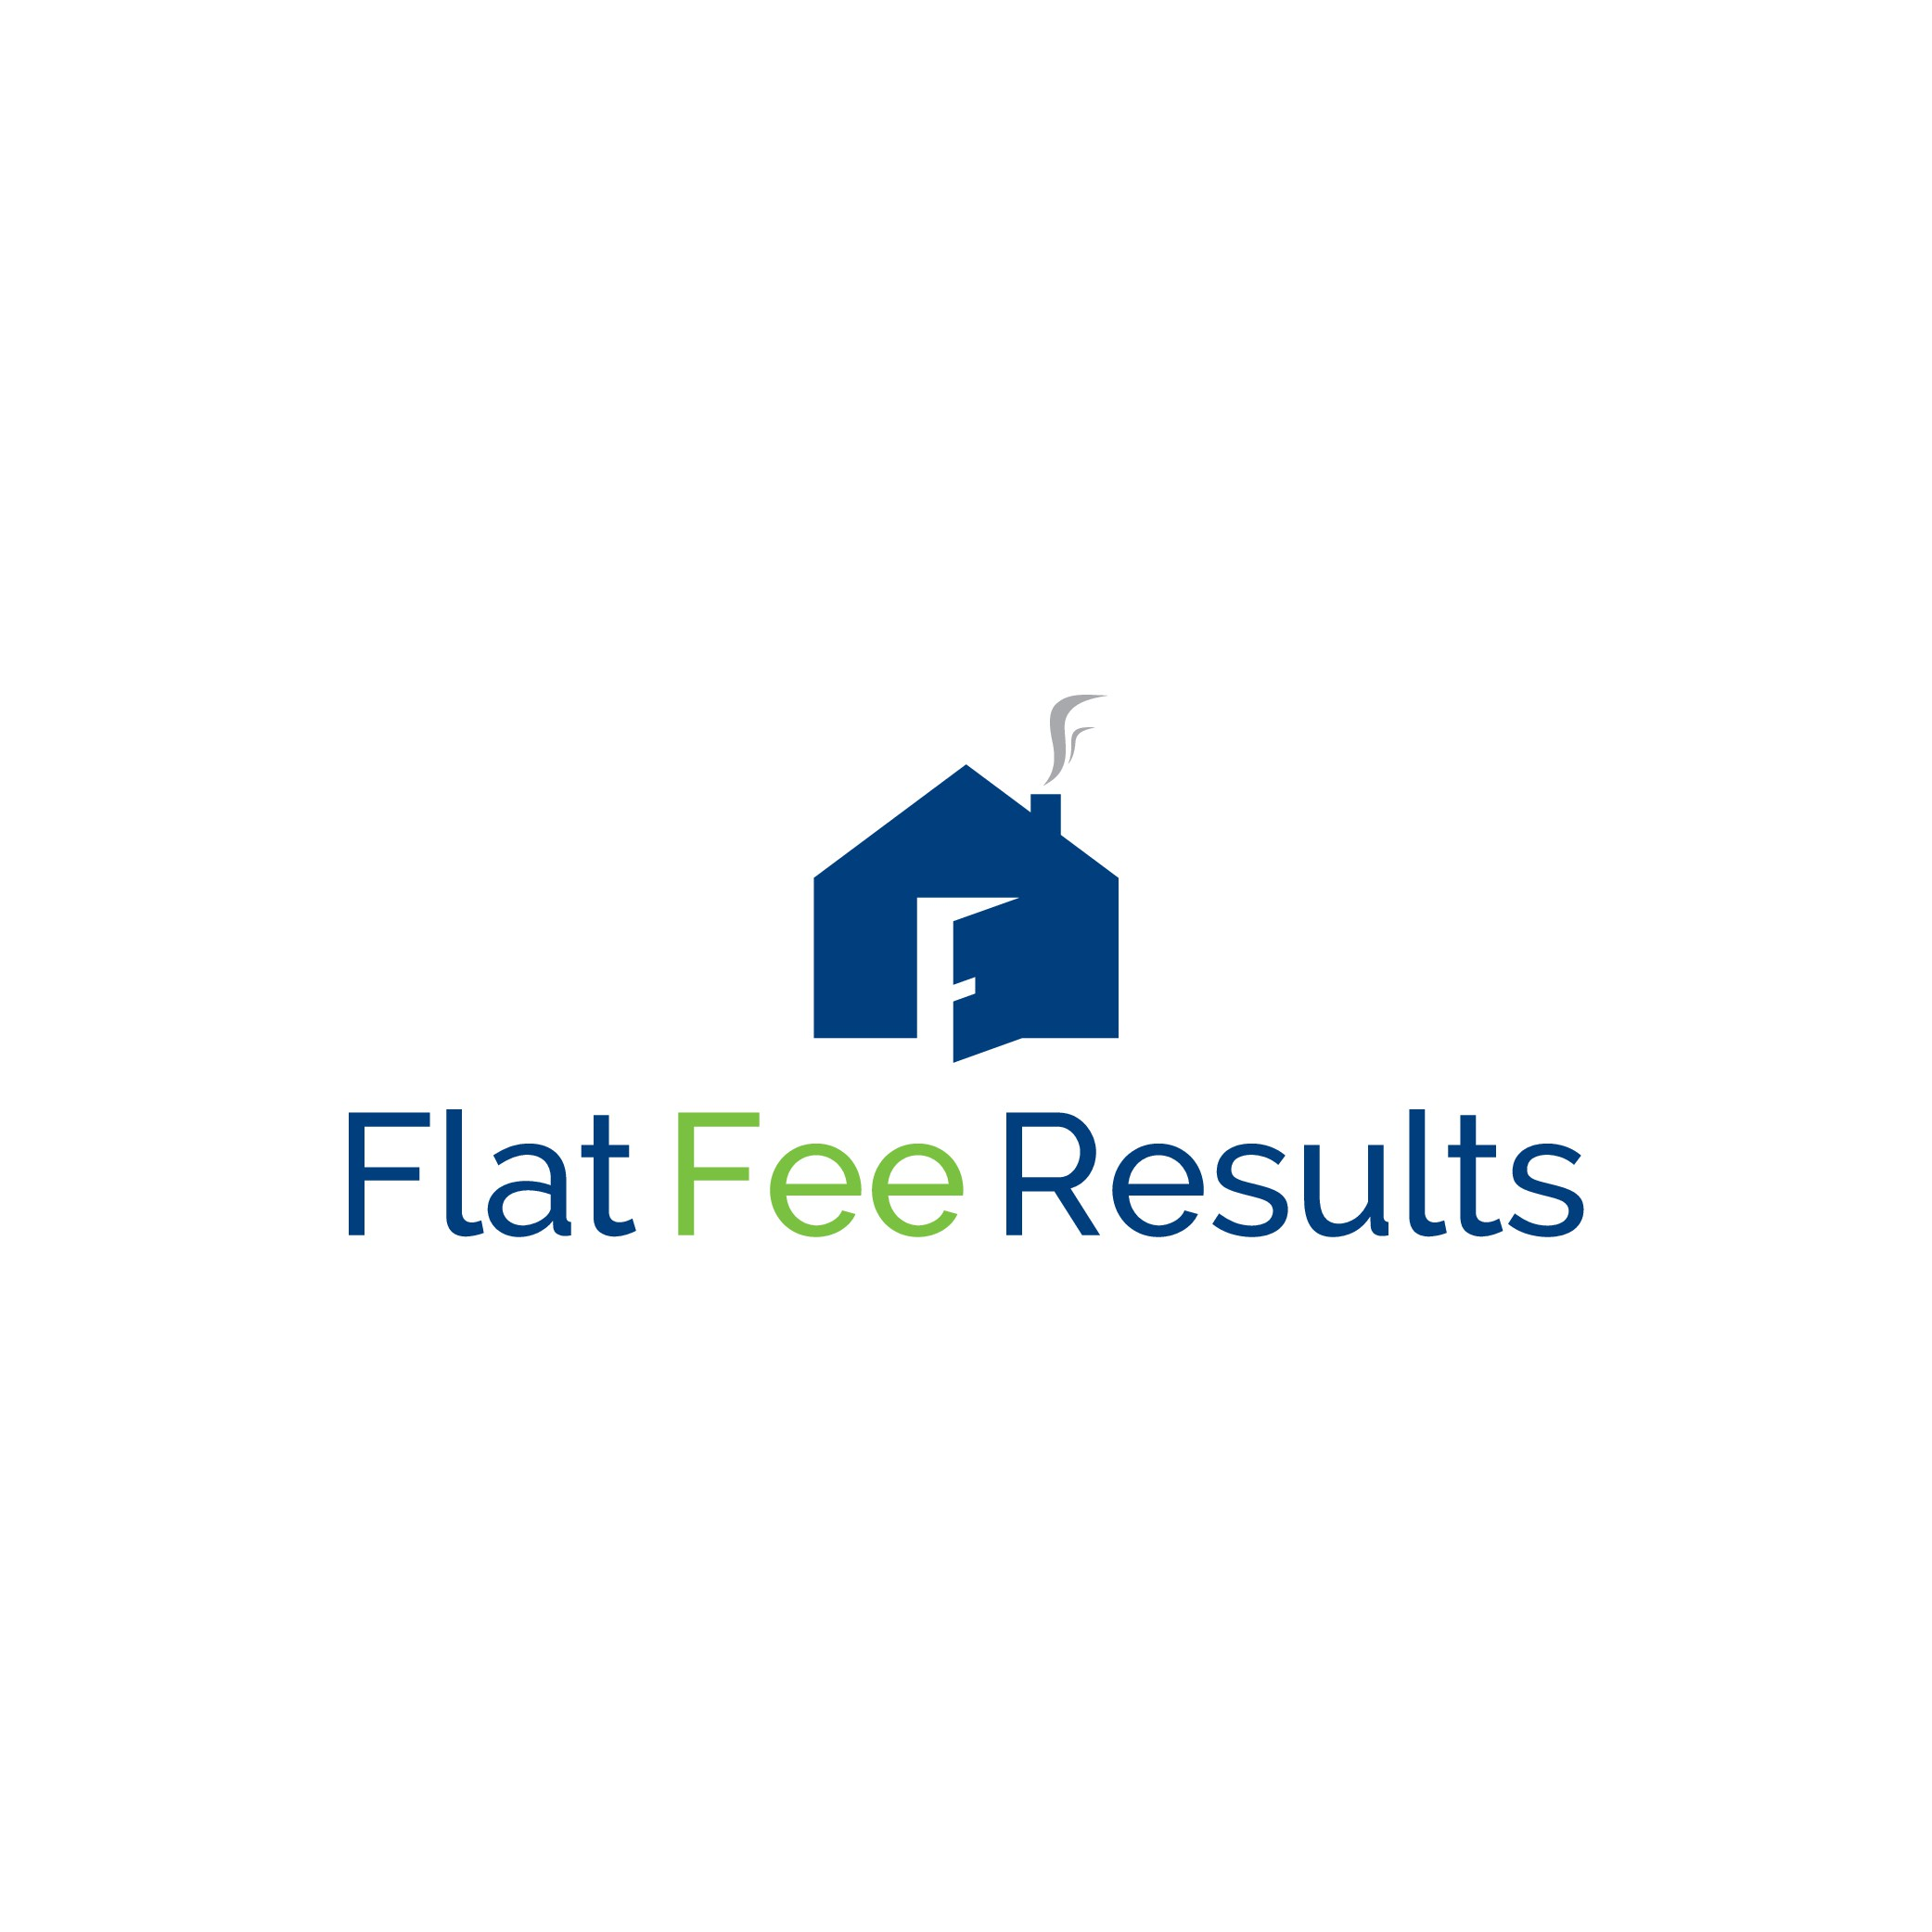 Need a modern logo for a flat fee real estate company